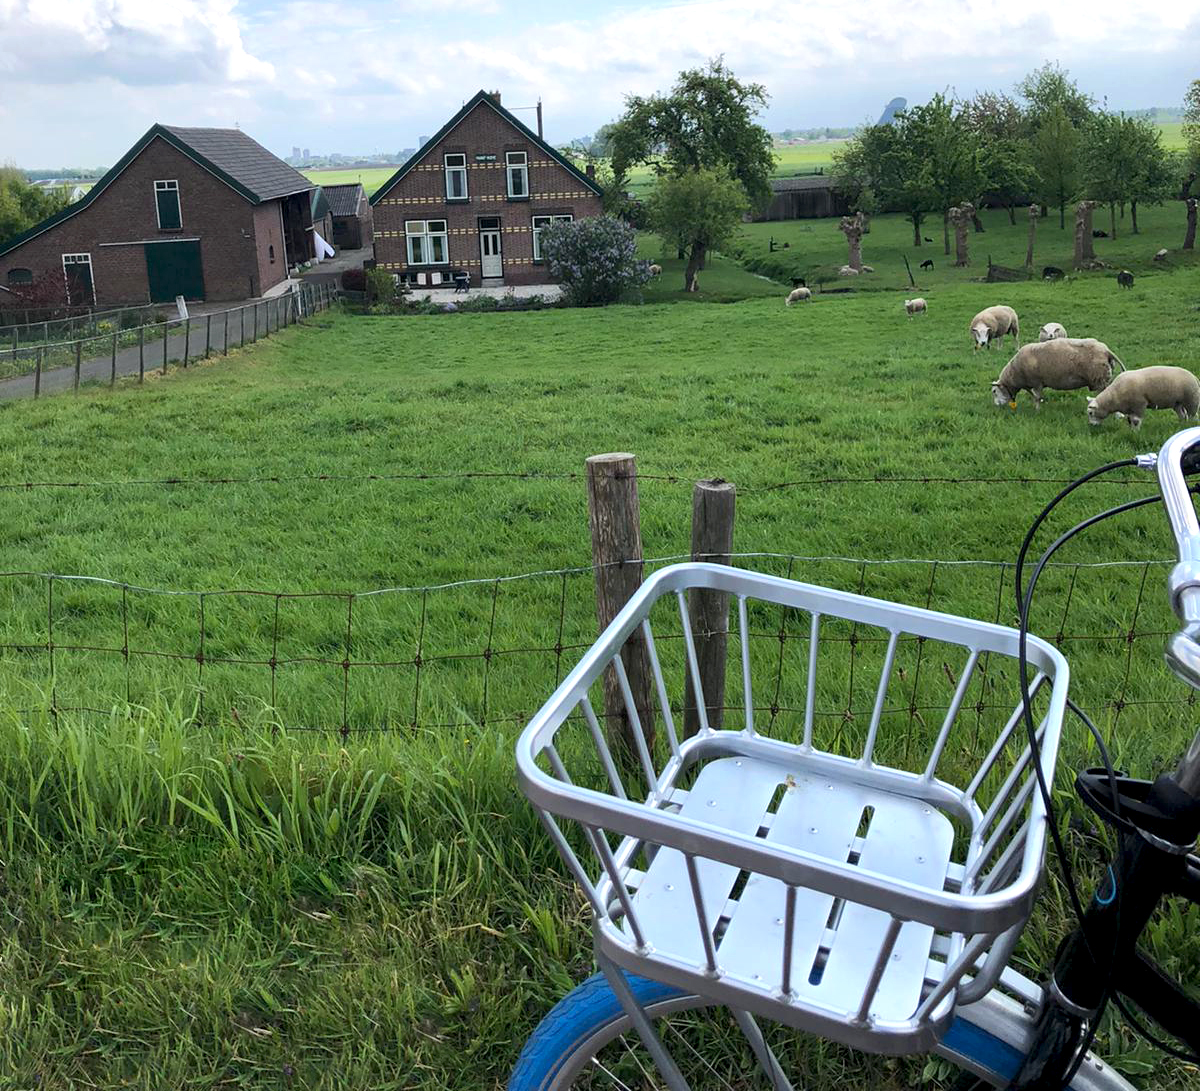 stompwijk_mooi_edit.jpg